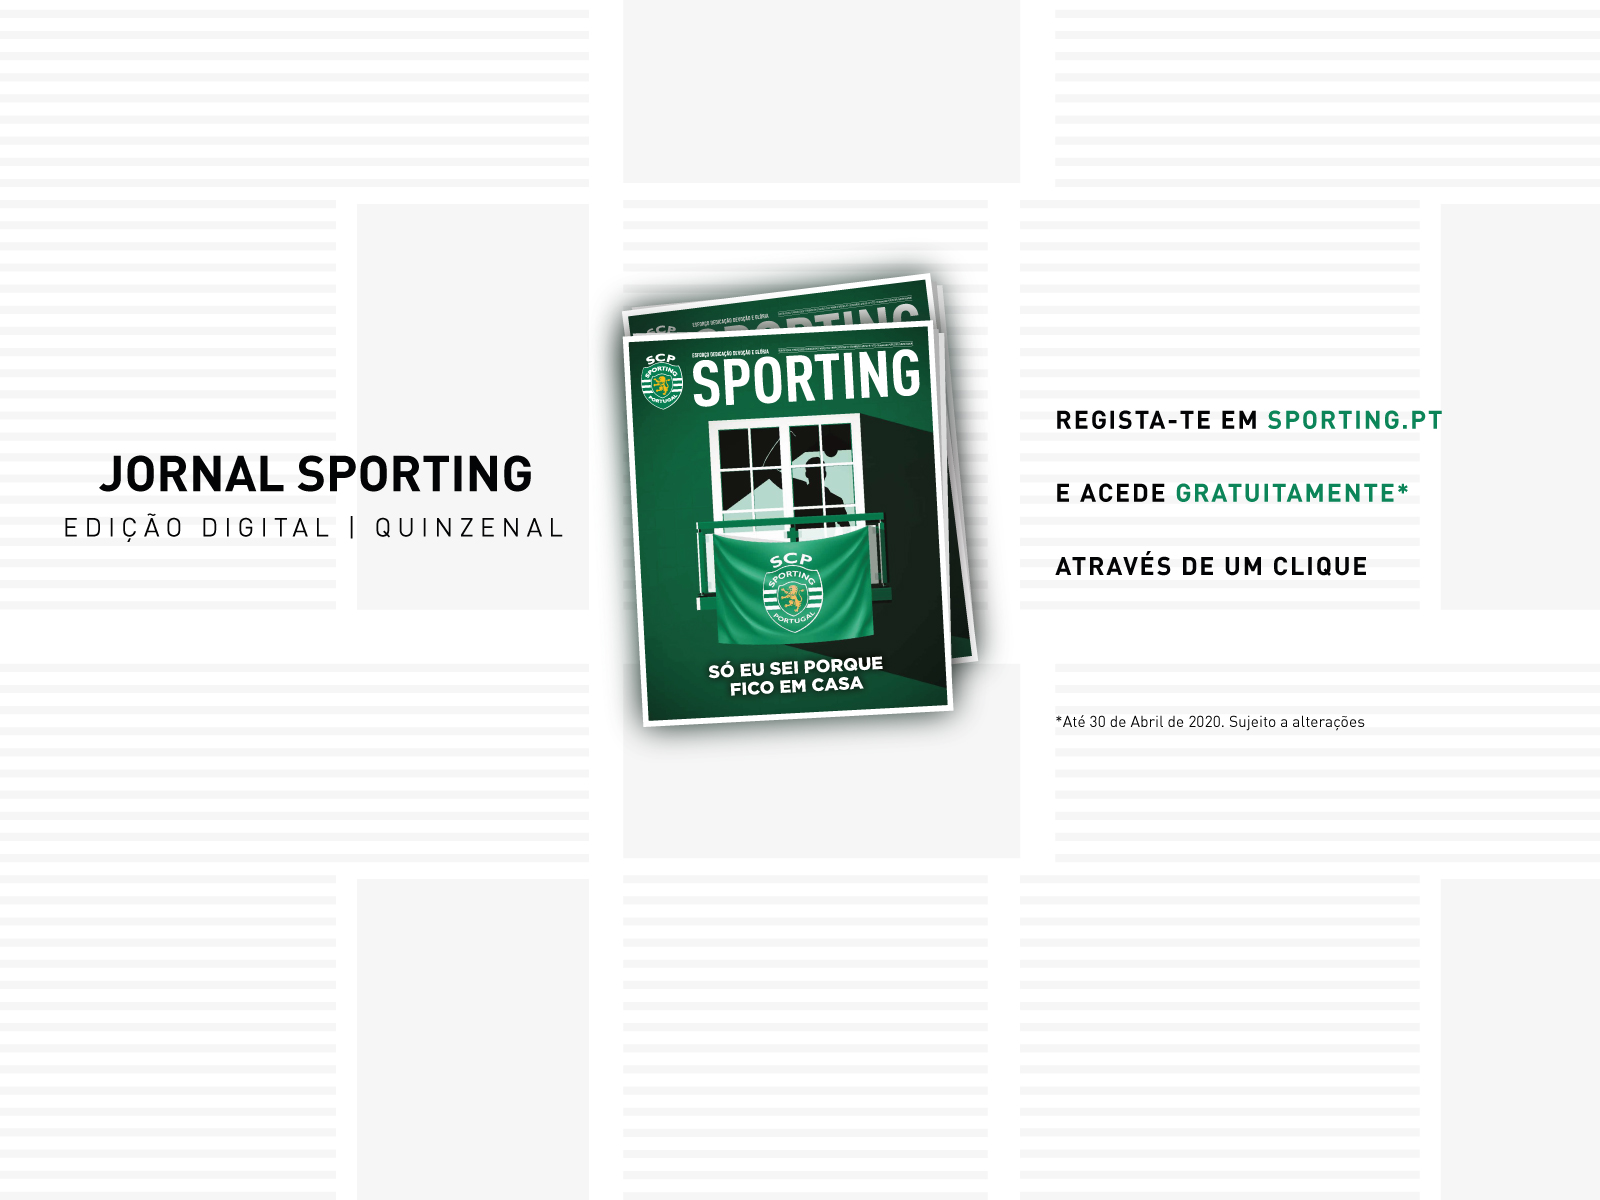 https://scpconteudos.pt/sites/default/files/revslider/image/Jornal-Sporting-Gratuito_Banner-HP.JPG